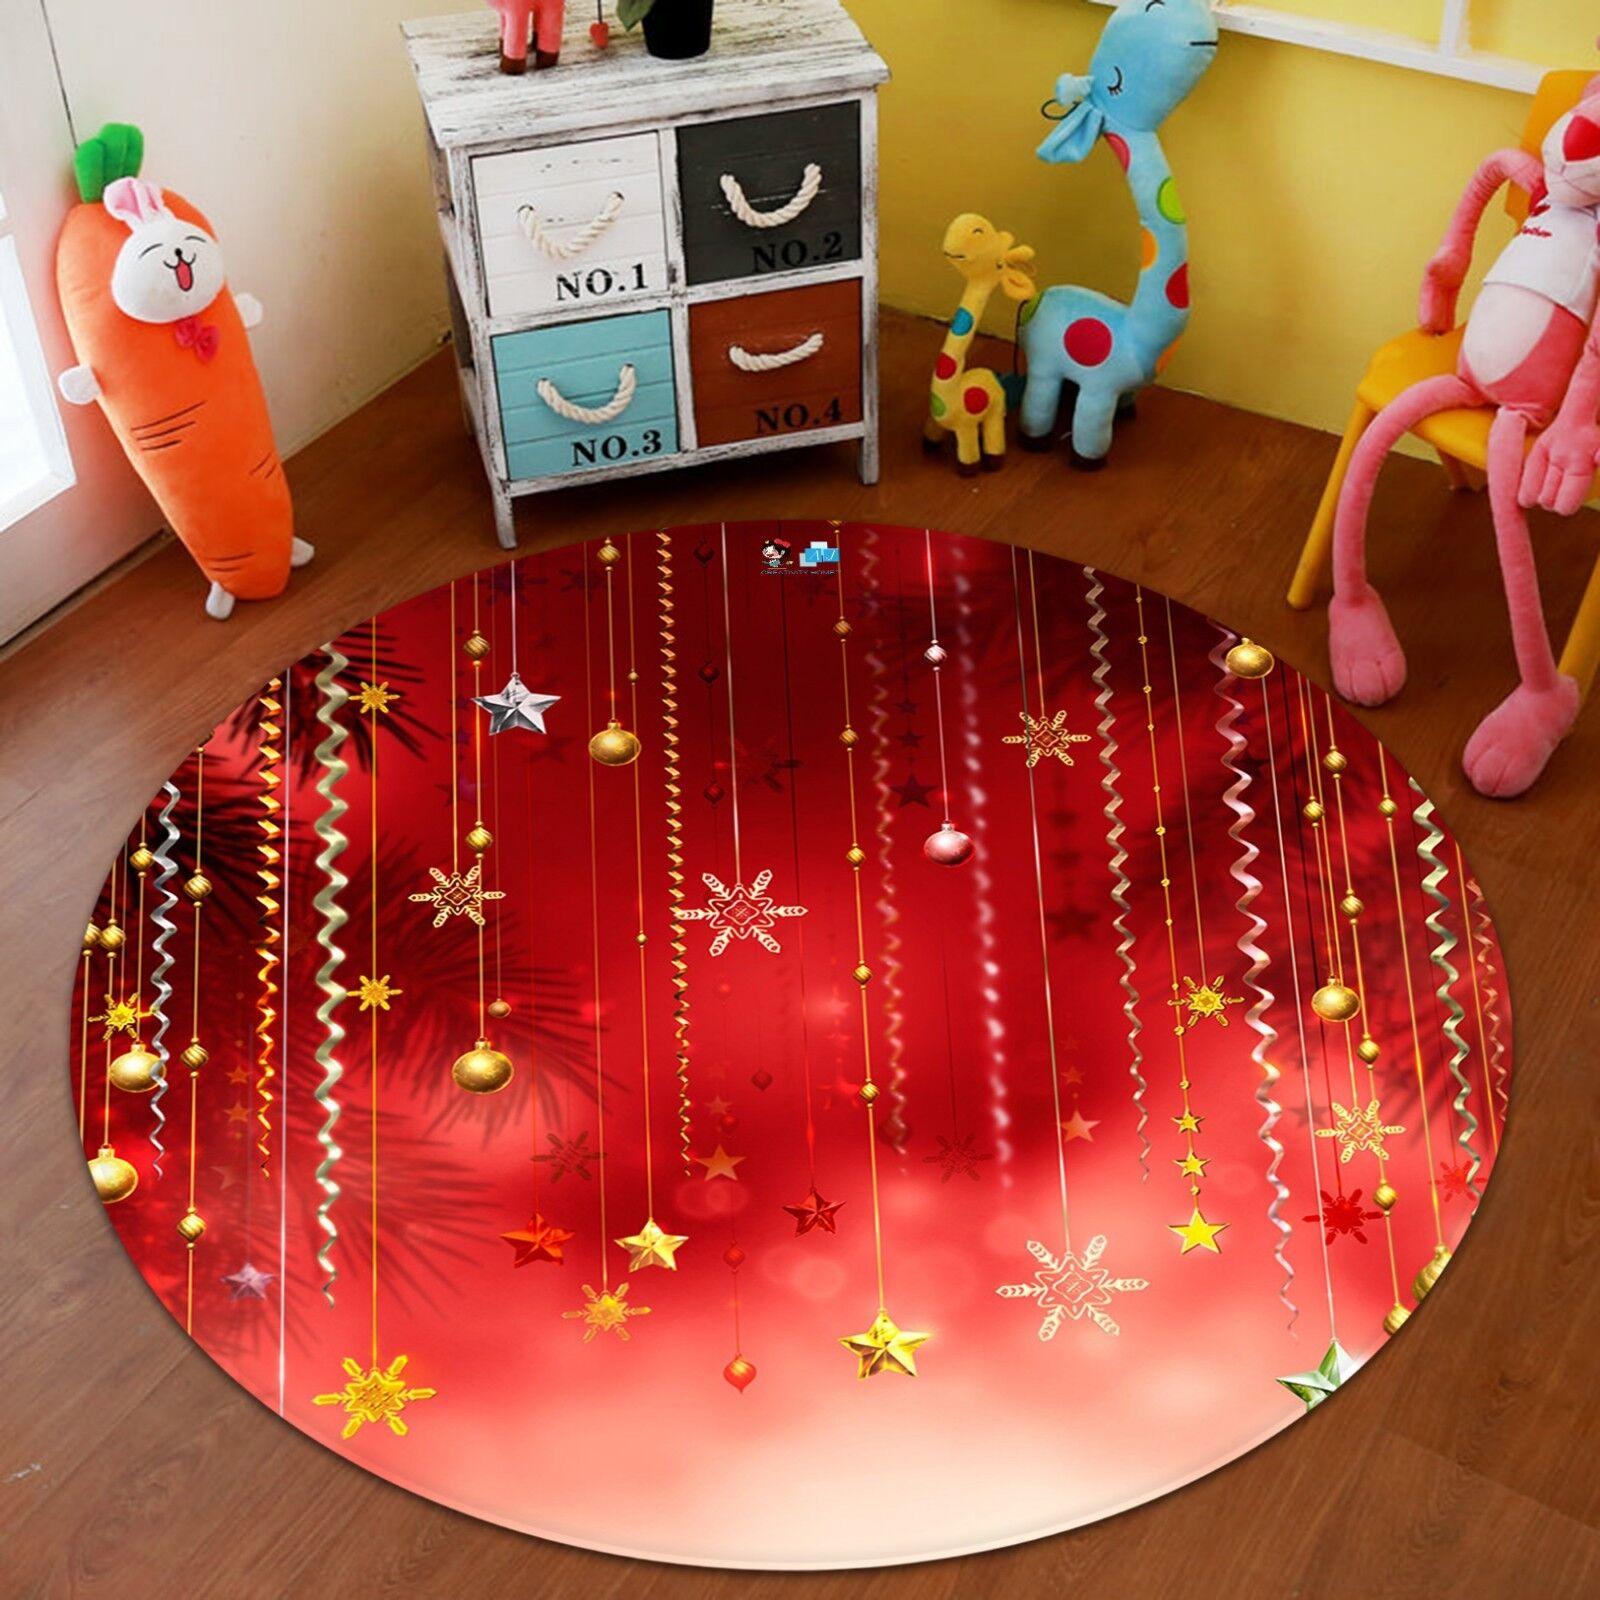 3d Natale Xmas 170 antiscivolo tappeto tappetino vano giri elegante TAPPETO de